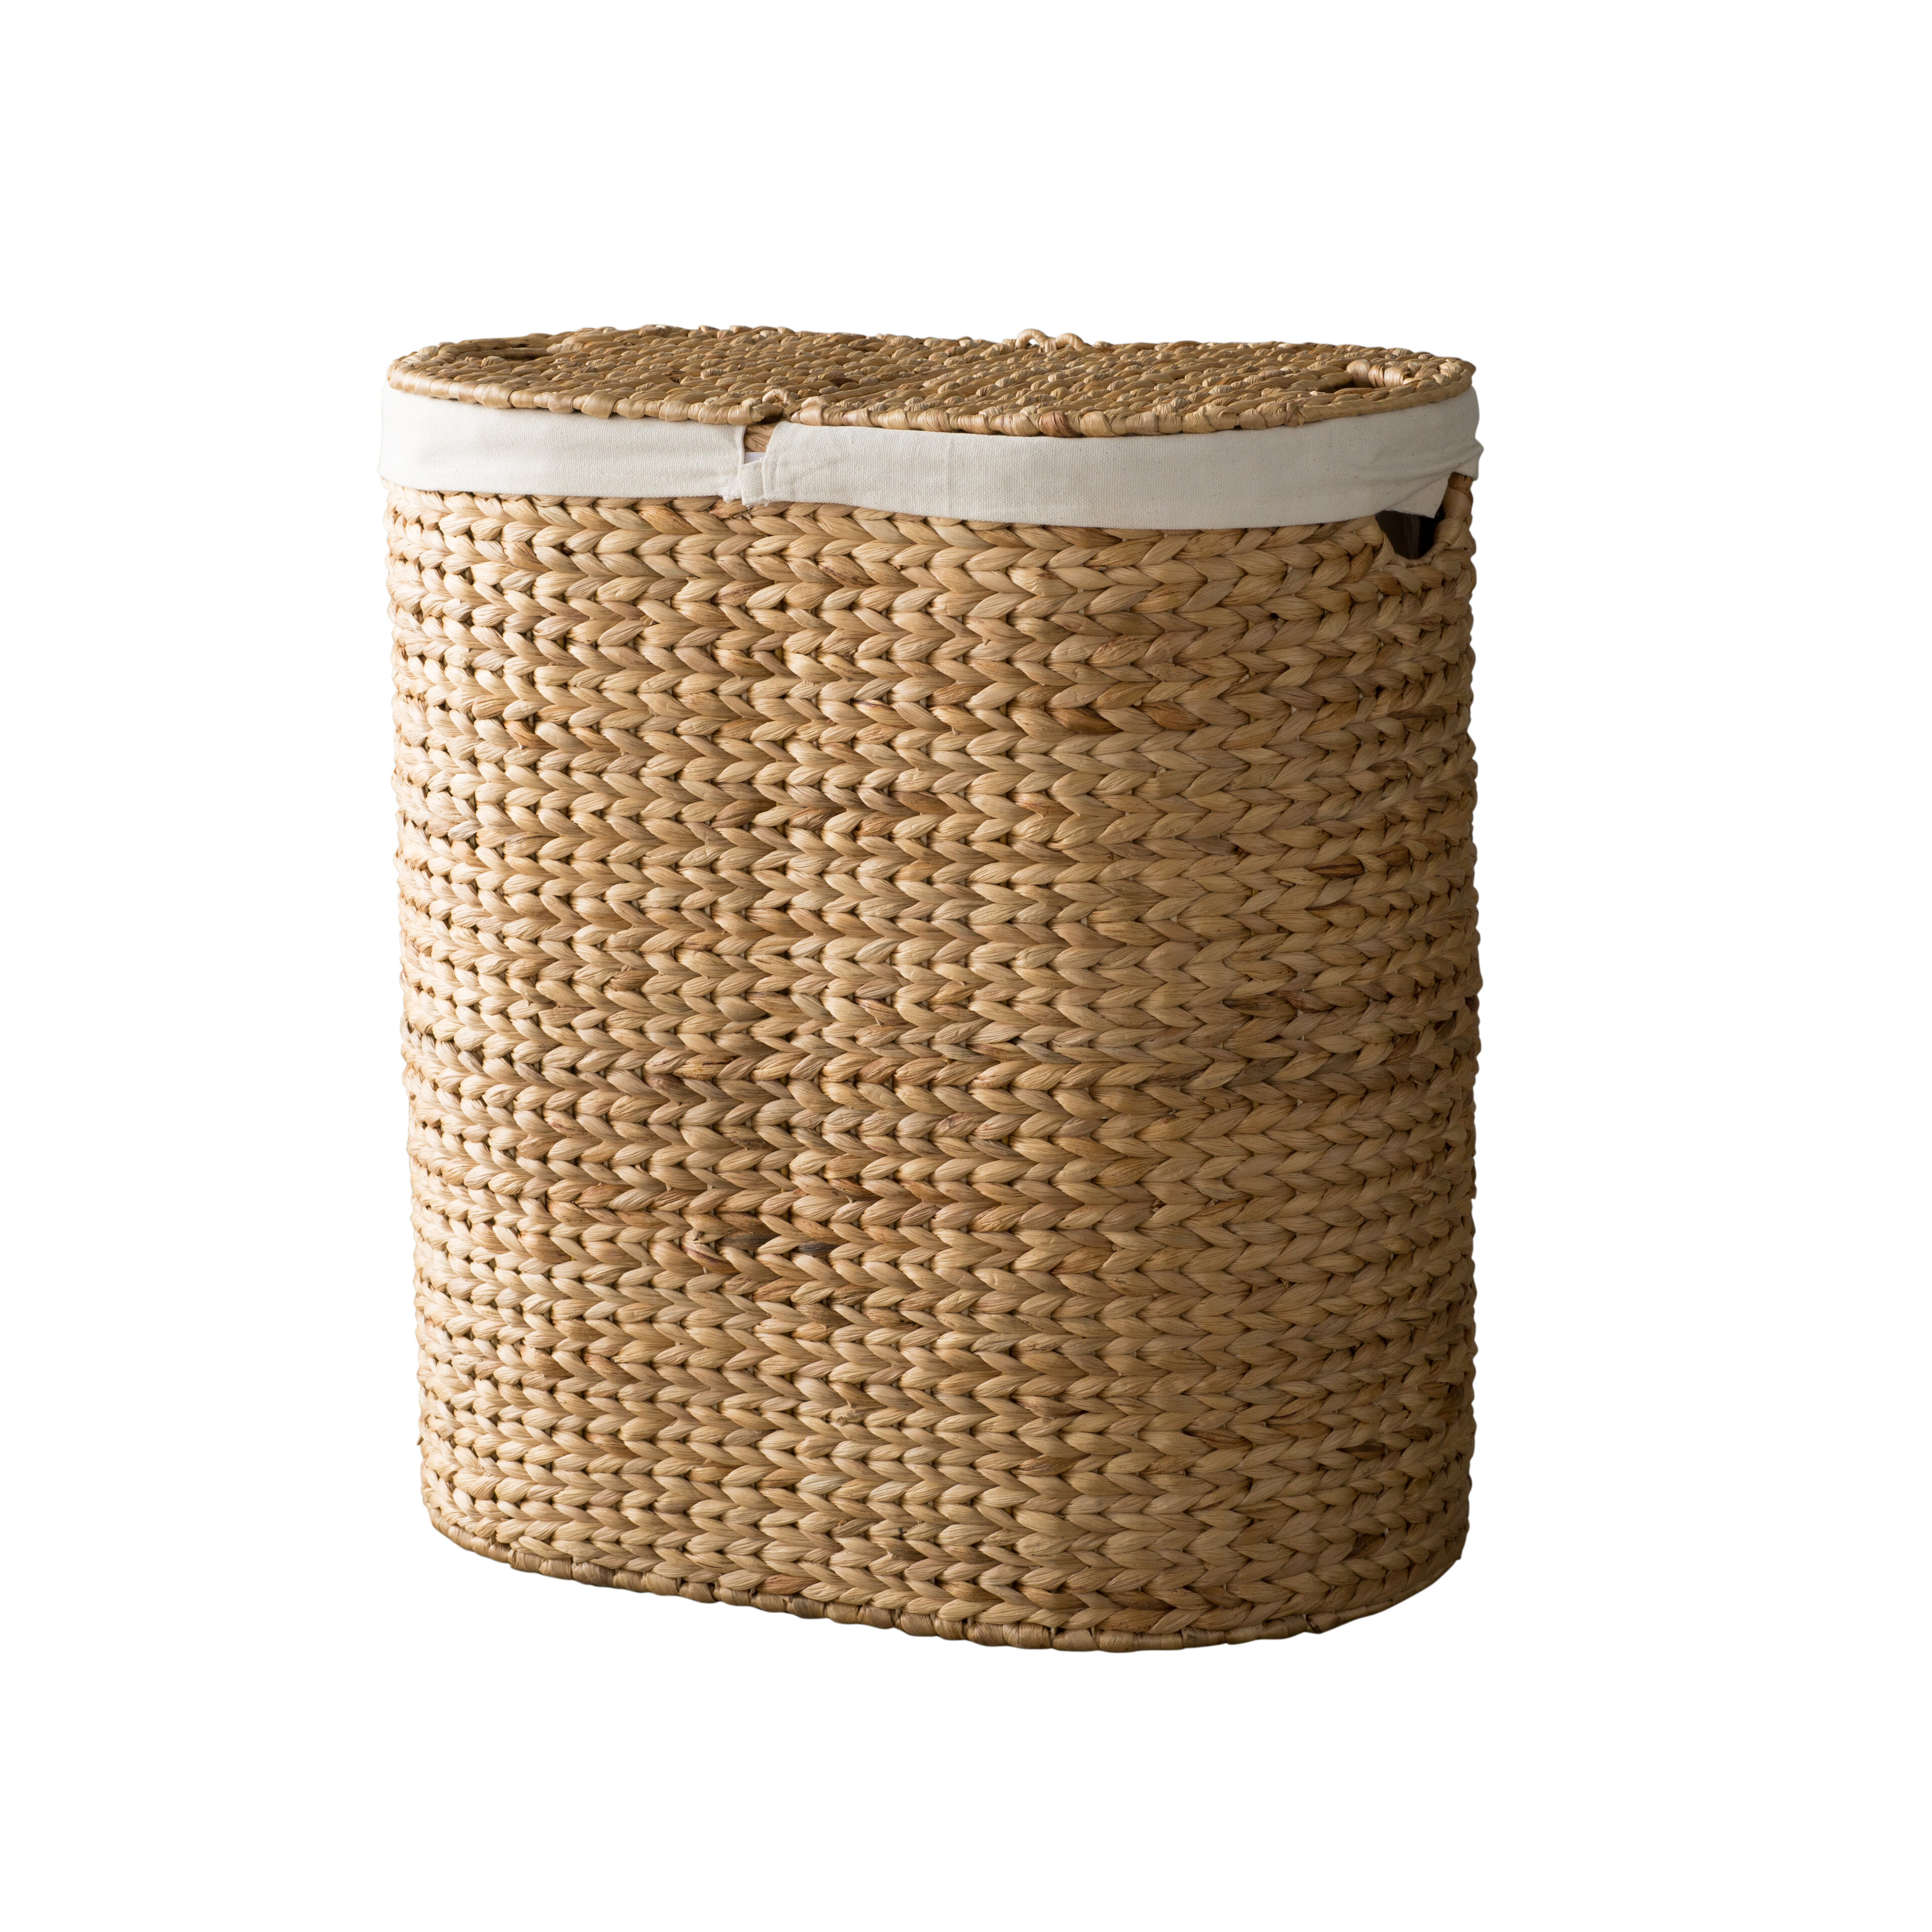 Black Foldable Single Hamper Basket with Lid and Removable Liner 14.5 x 14.5 x 25.5 Black NEX Laundry Hamper 14.5 x 14.5 x 25.5